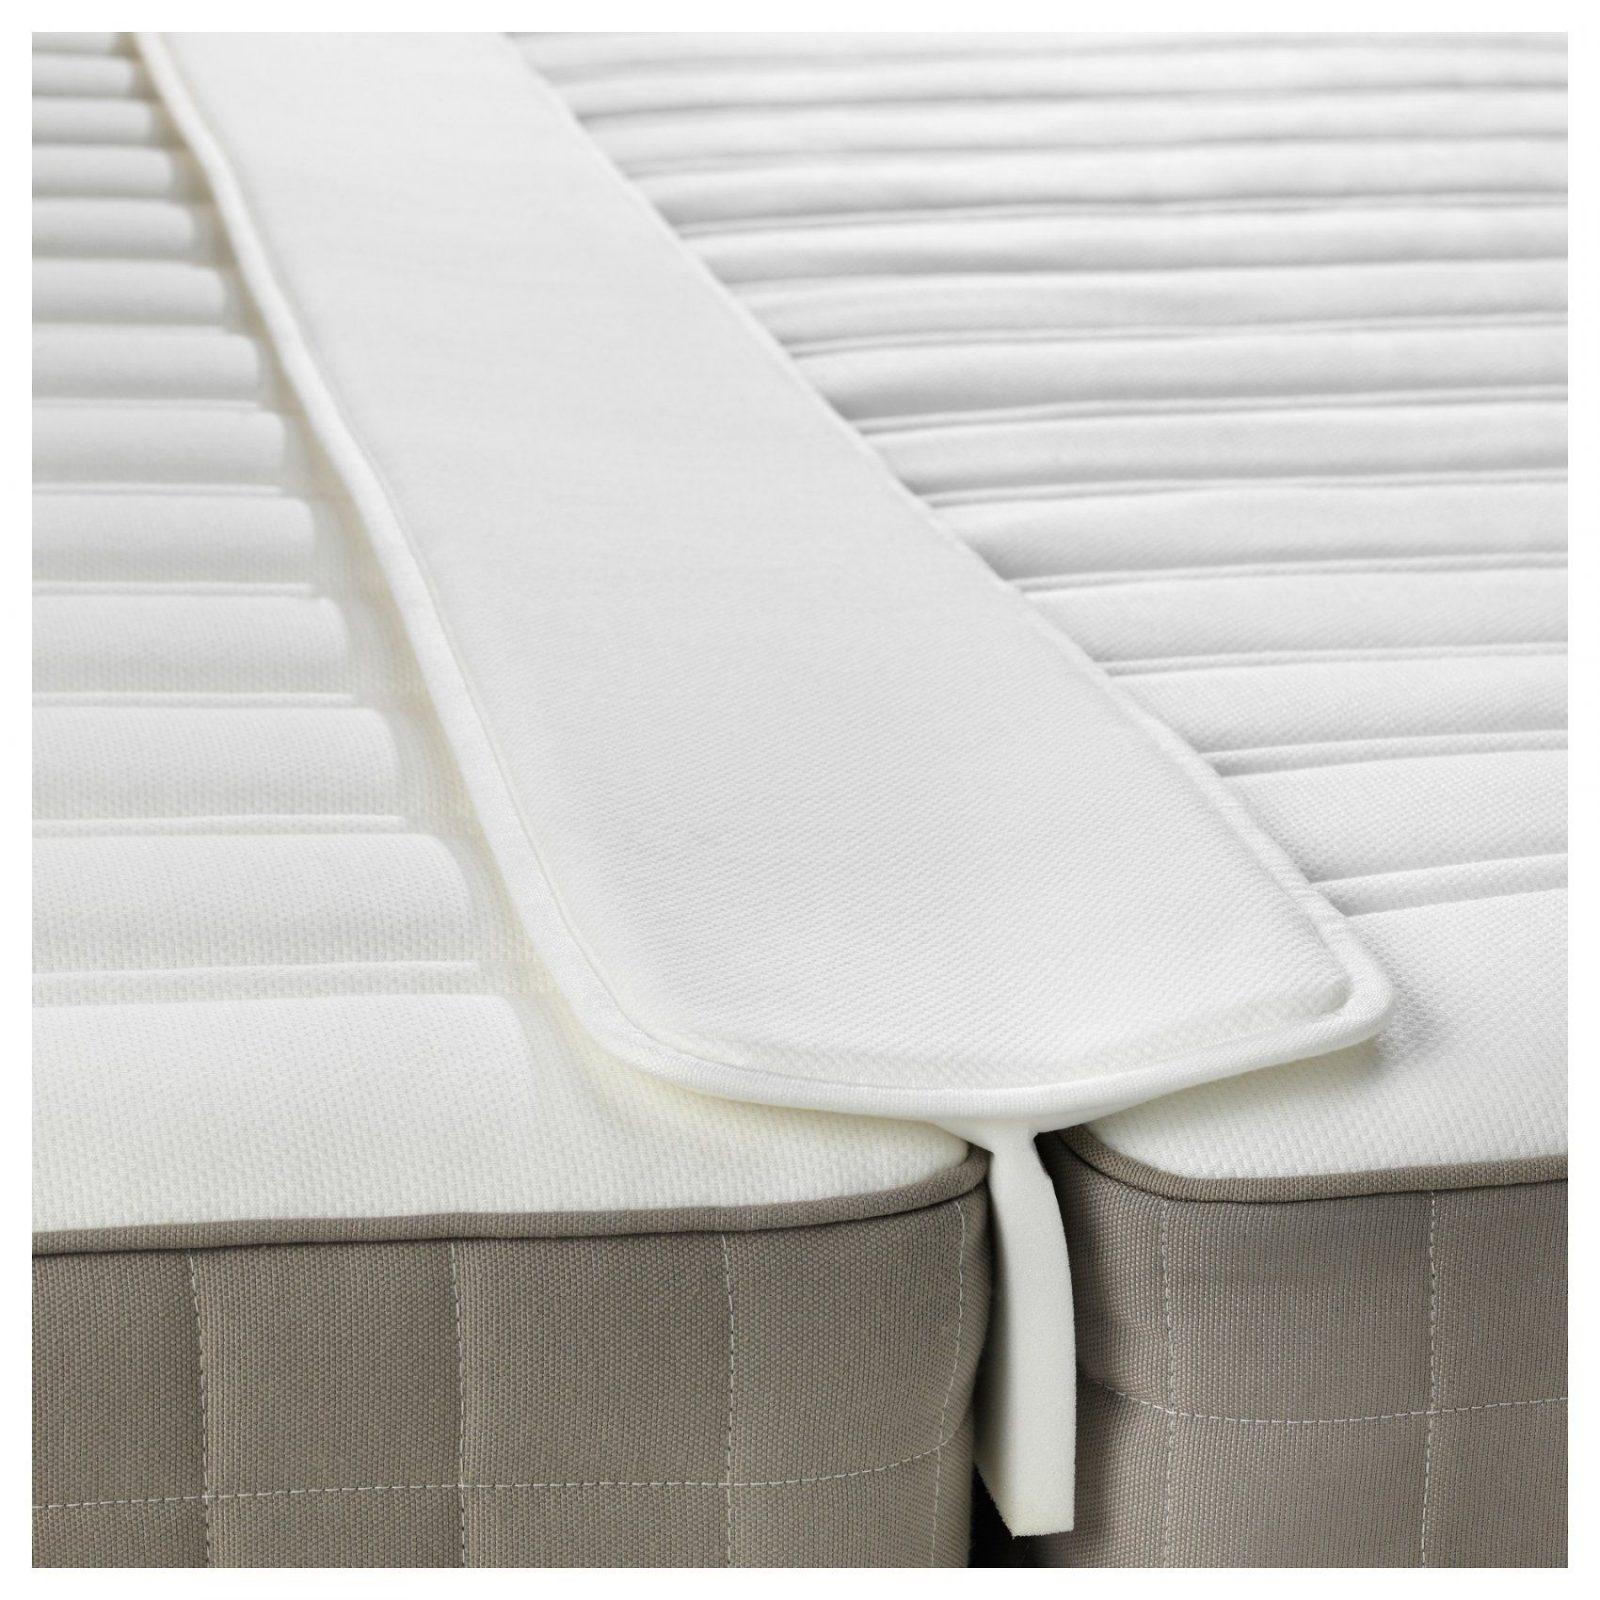 matratzen ritzenf ller ikea haus design ideen. Black Bedroom Furniture Sets. Home Design Ideas